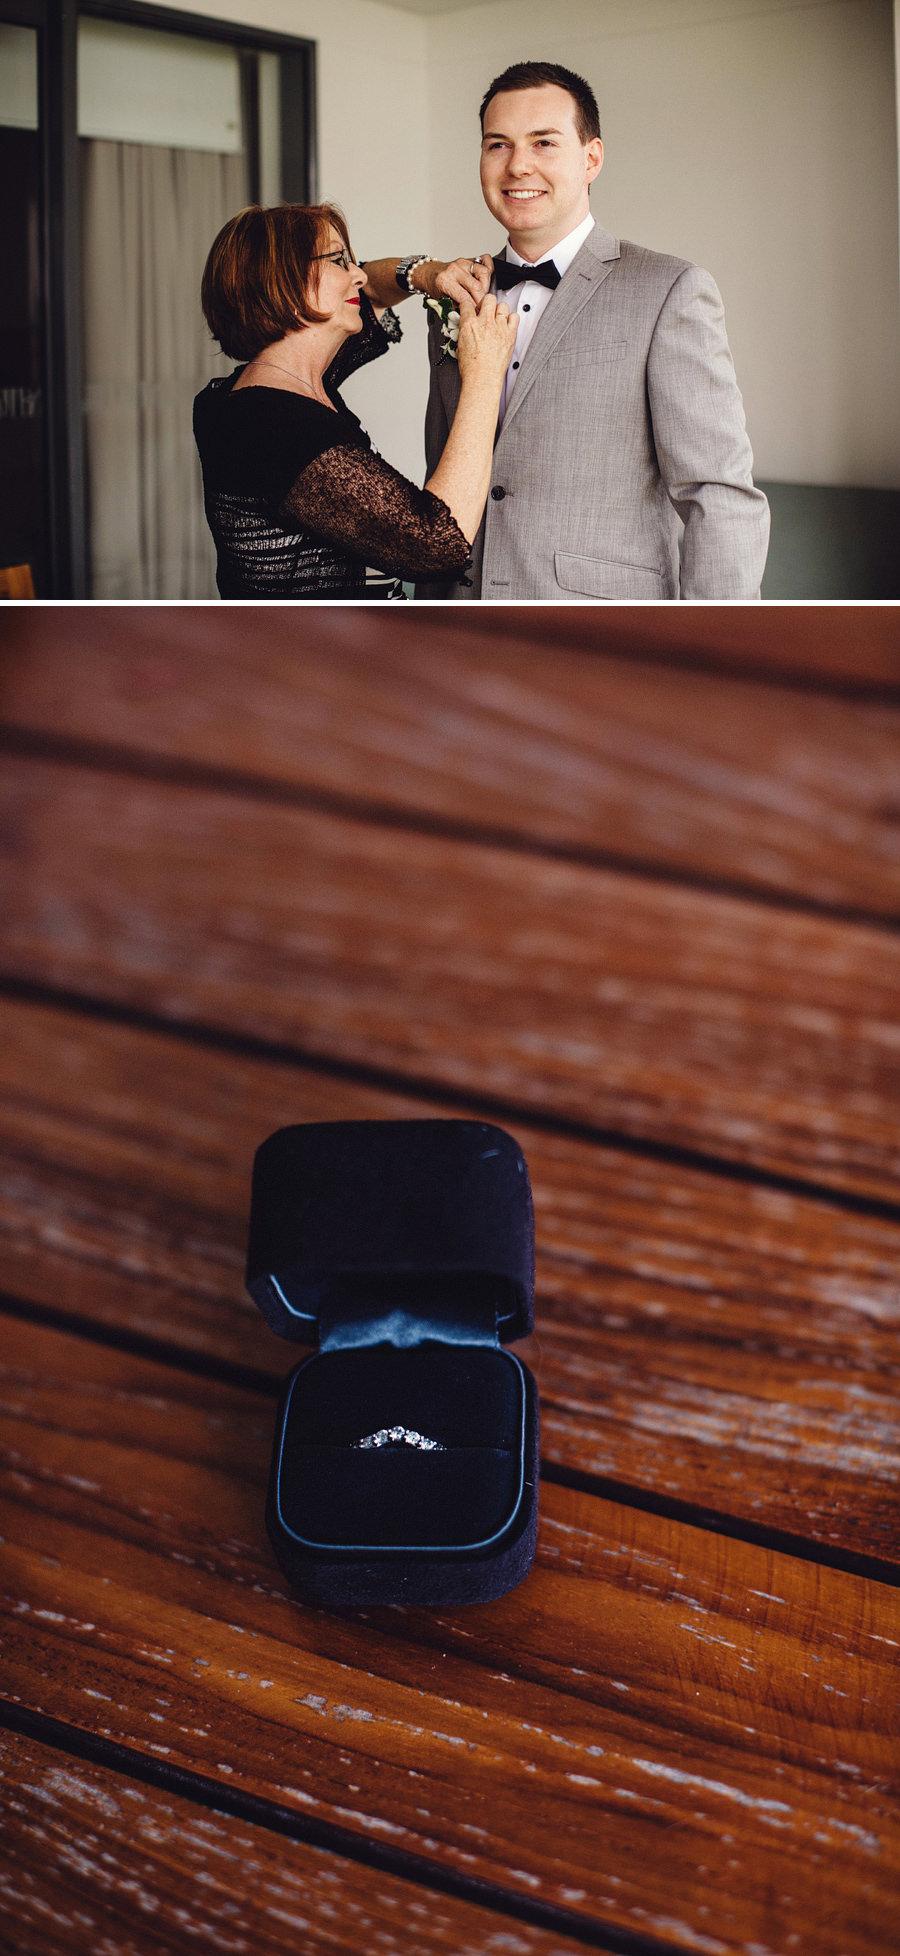 Timeless Wedding Photographer: Groom getting ready